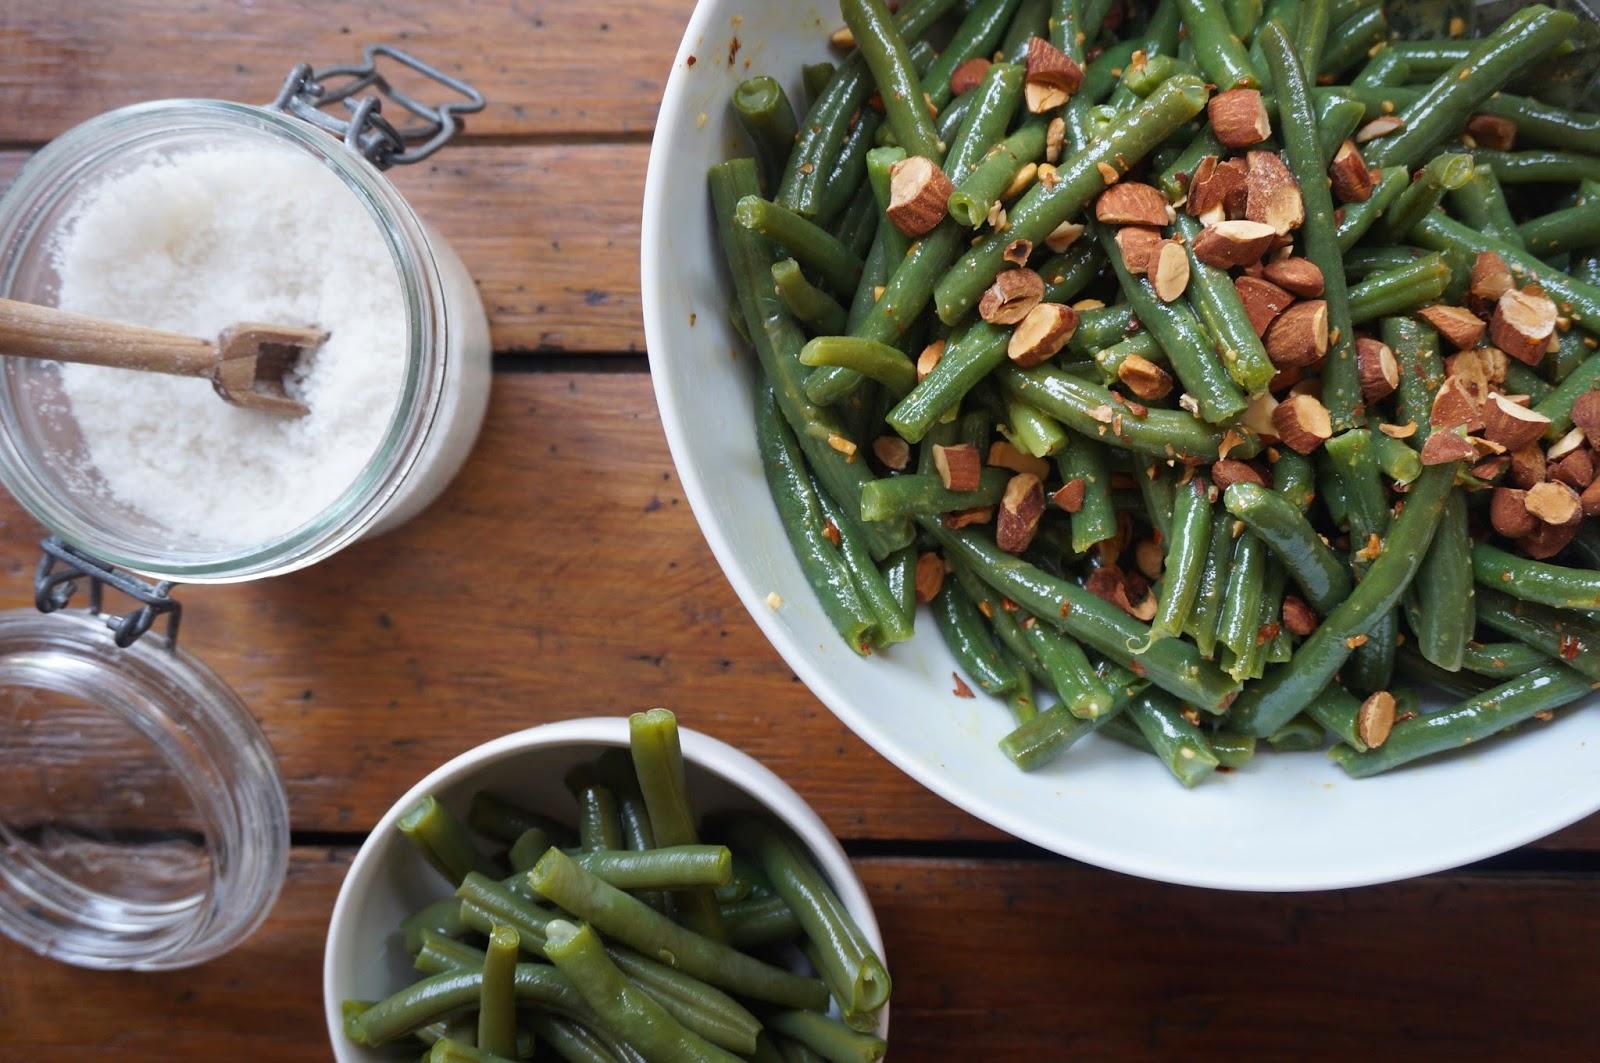 recettes salades originales pour barbecue. Black Bedroom Furniture Sets. Home Design Ideas